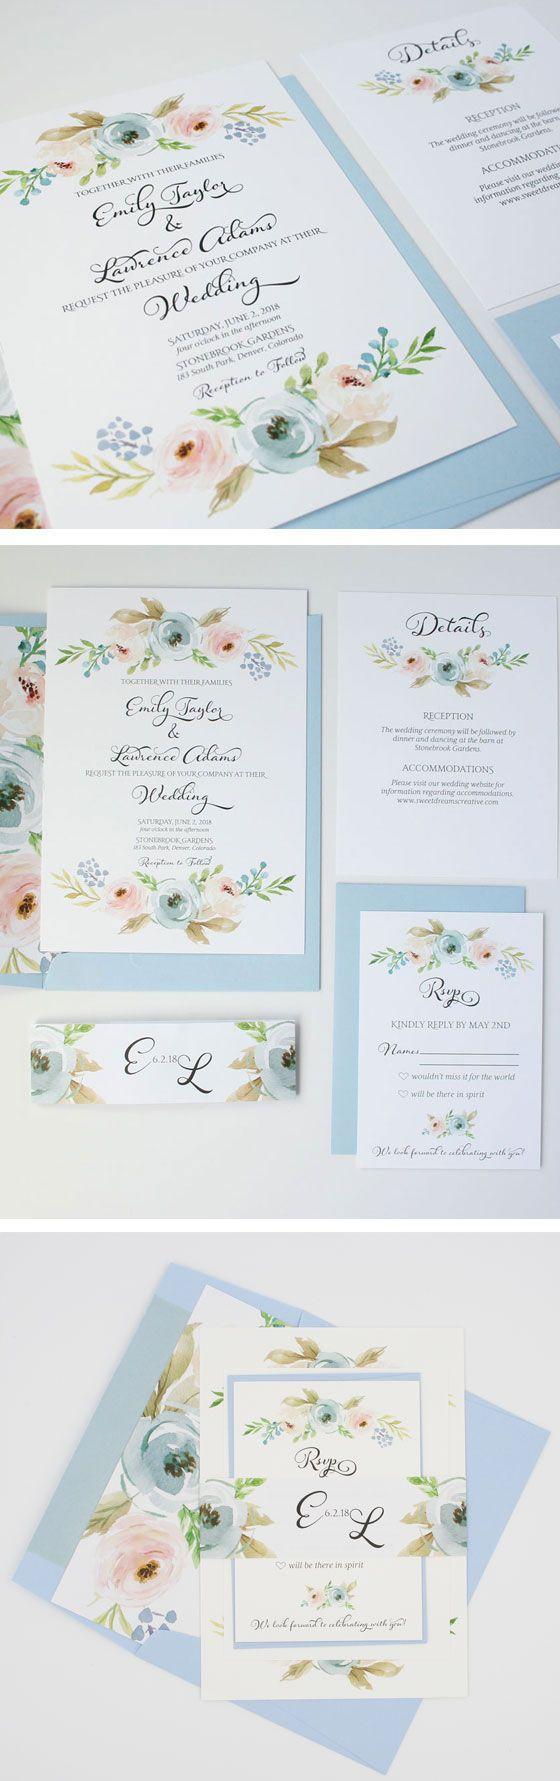 Dusty Blue Wedding Invitations - Pastel Floral Wedding Invitation ...